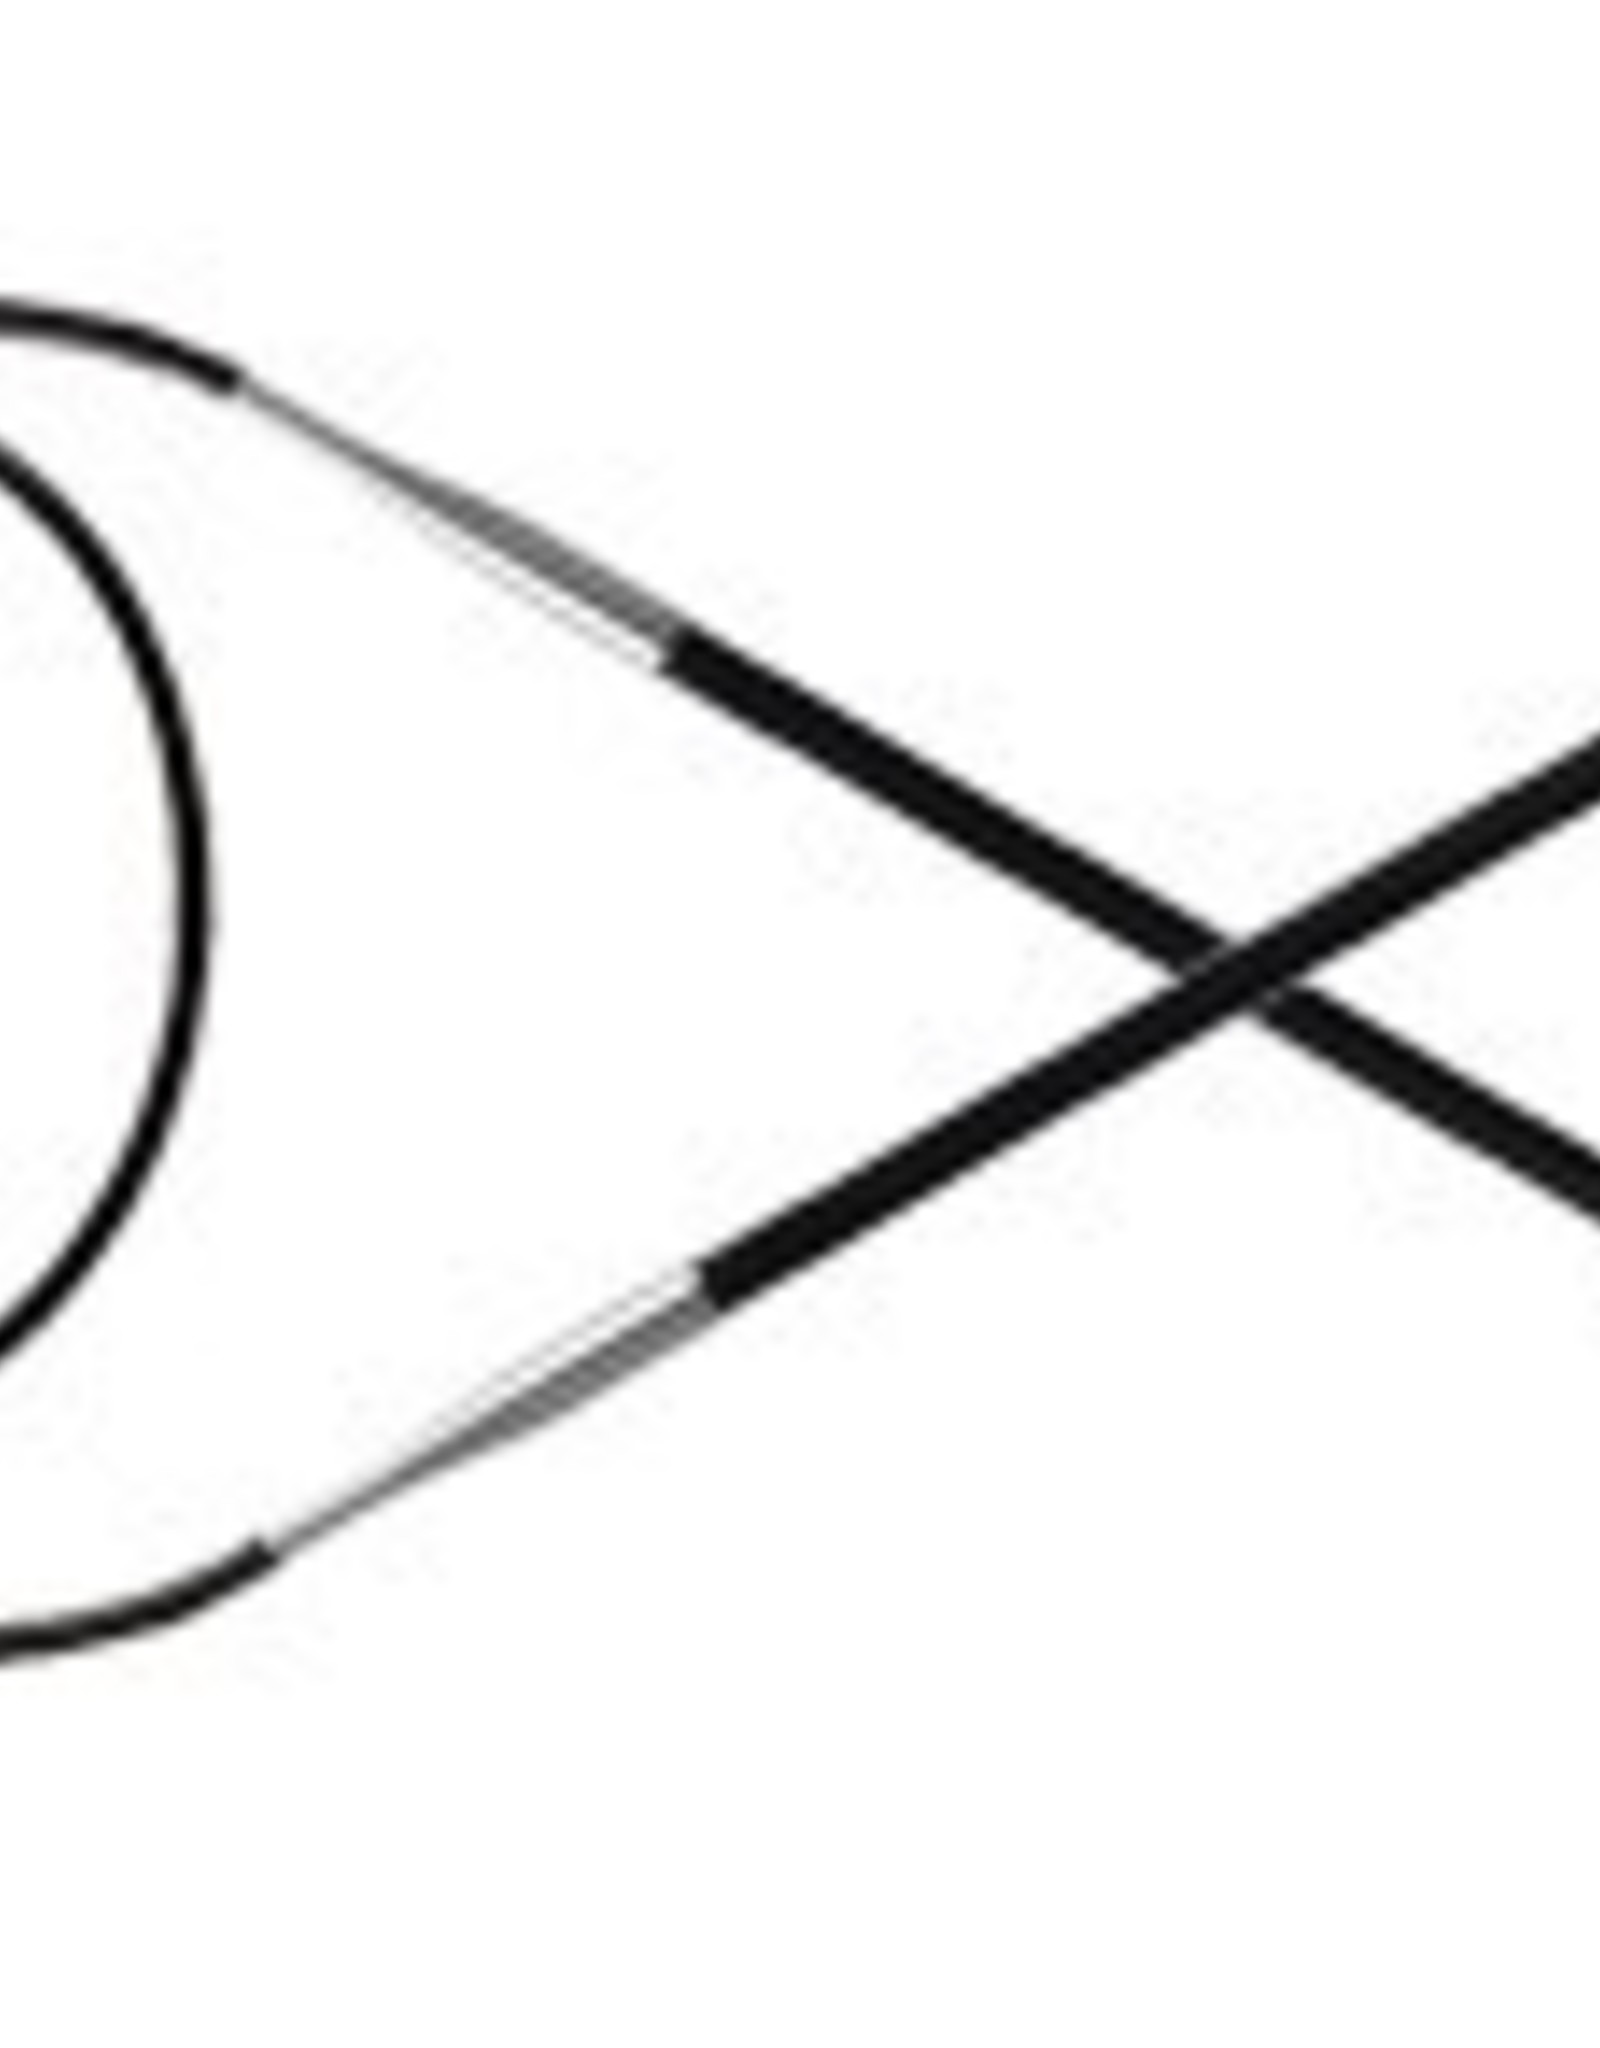 Knitter's Pride 2 Karbonz Circular 40